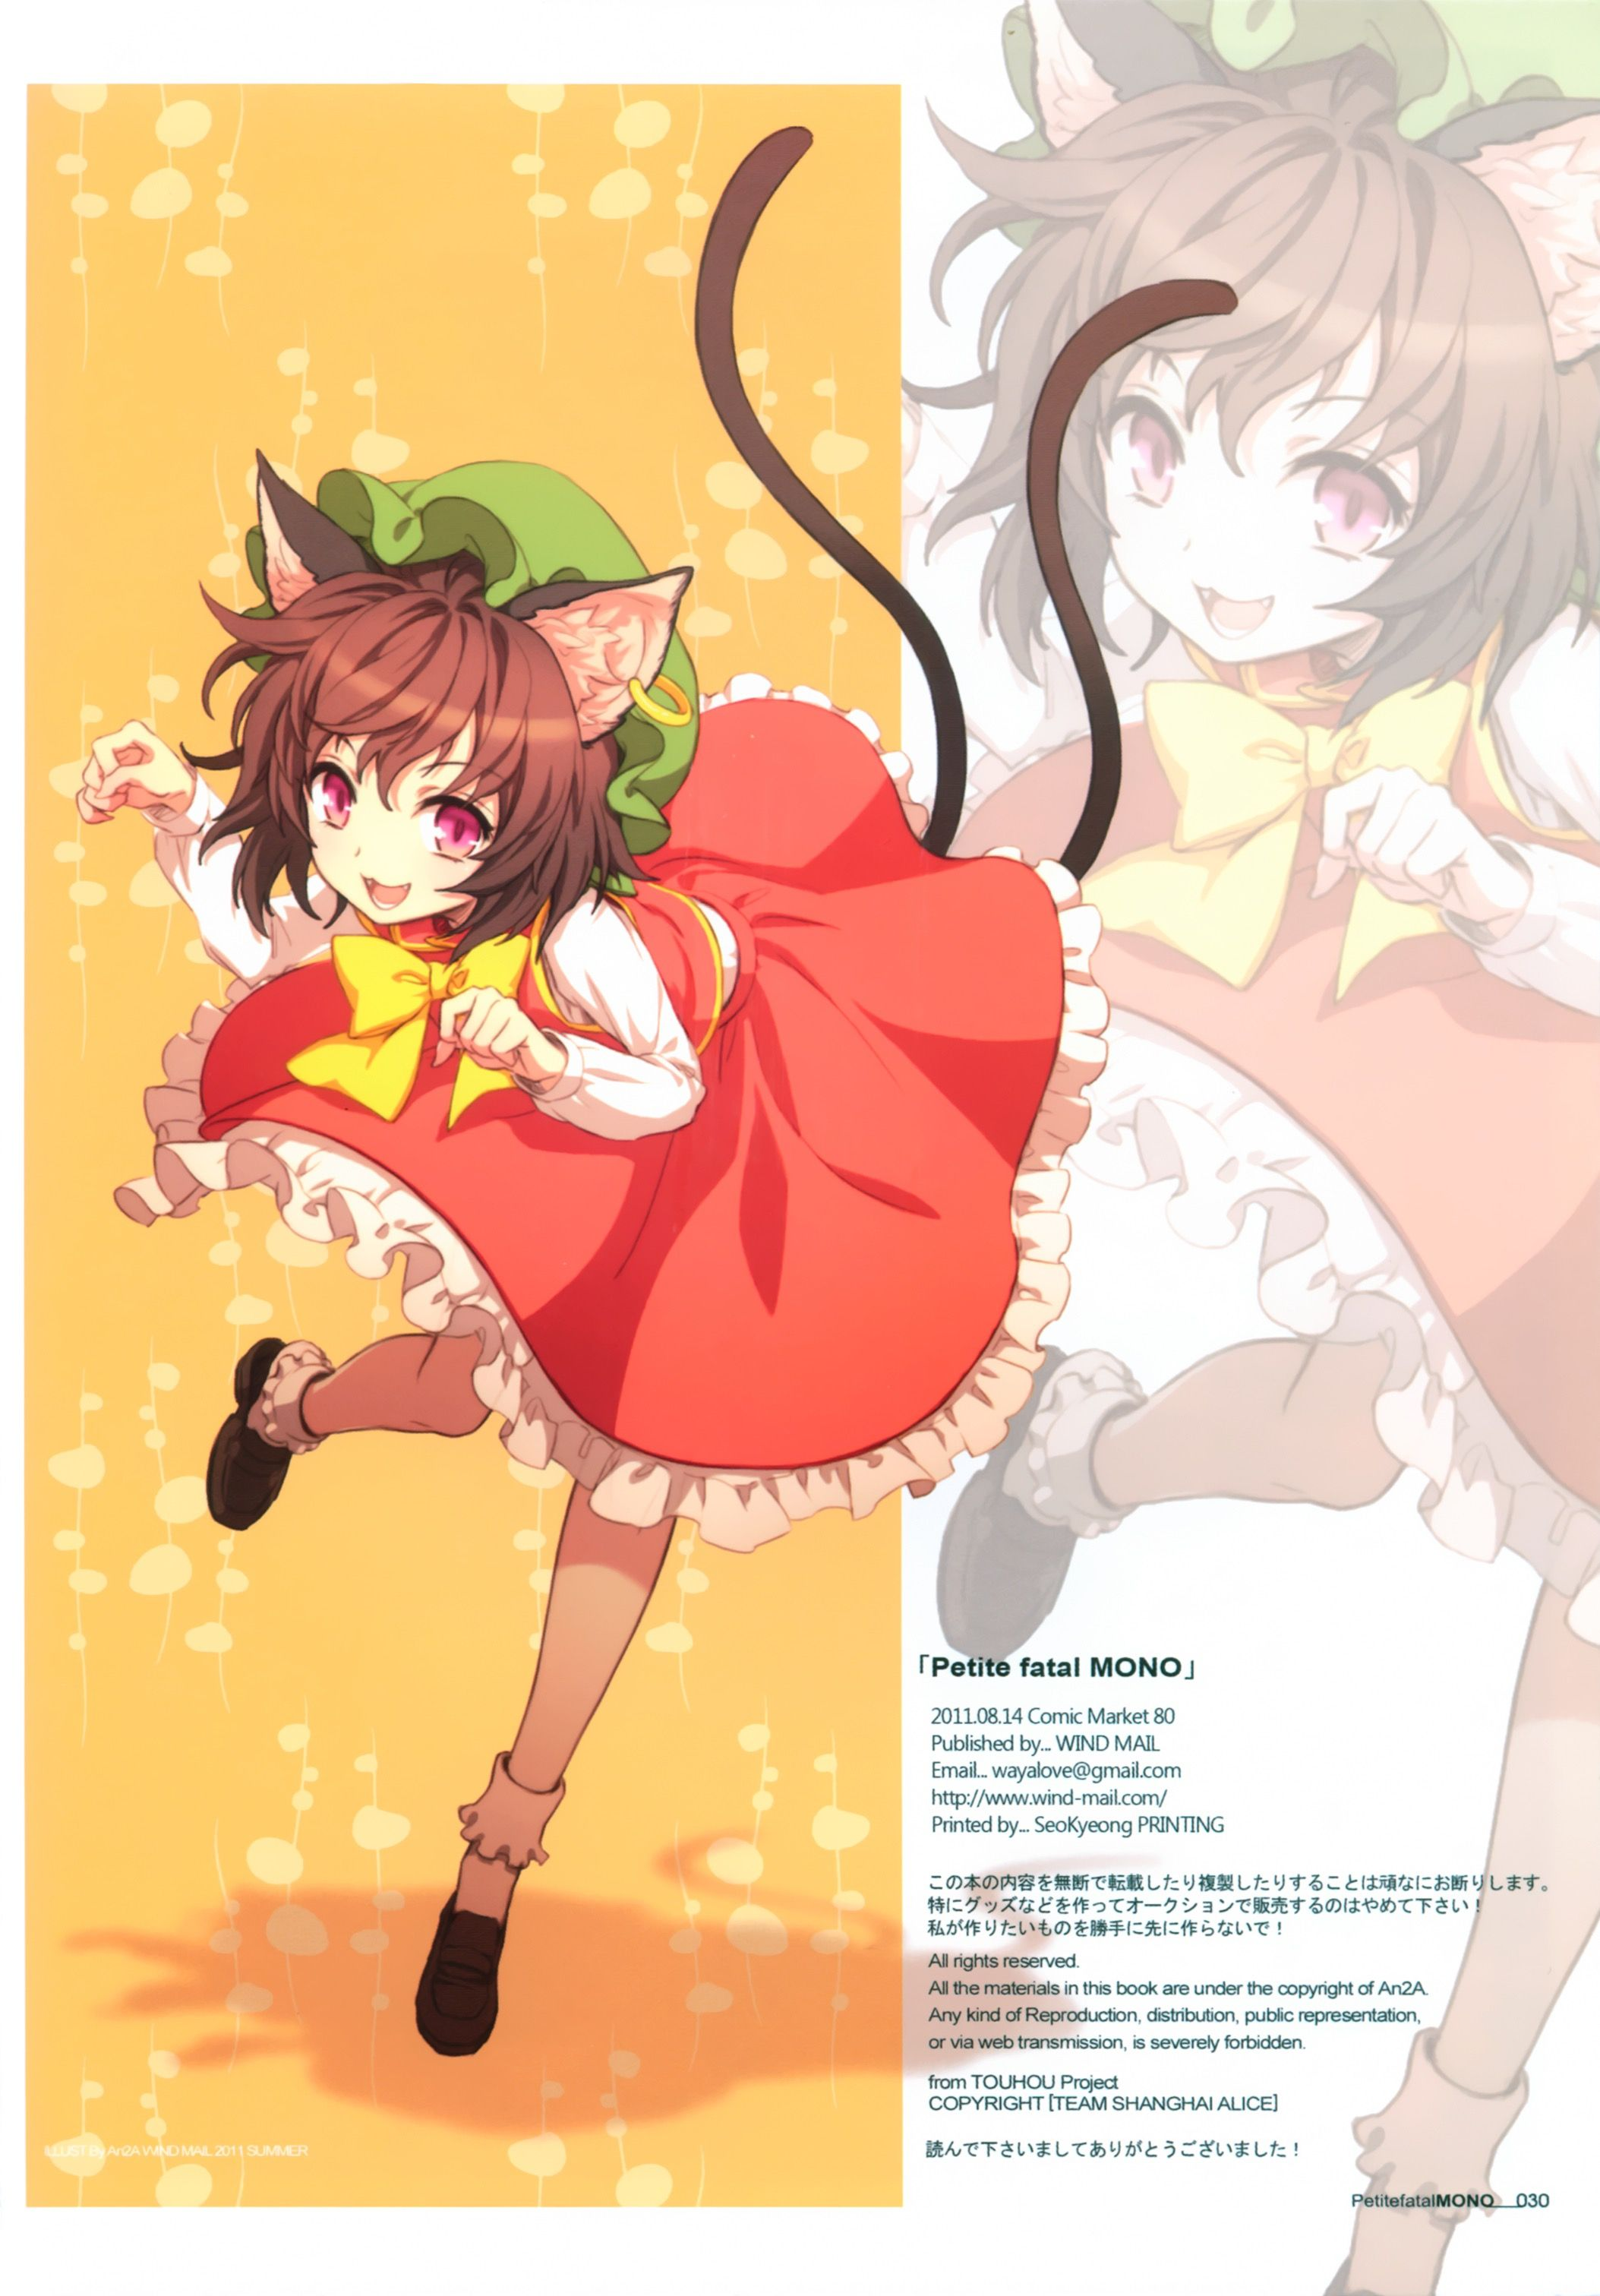 touhou part 32 8nqdef 東方 touhou anime anime images anime artwork